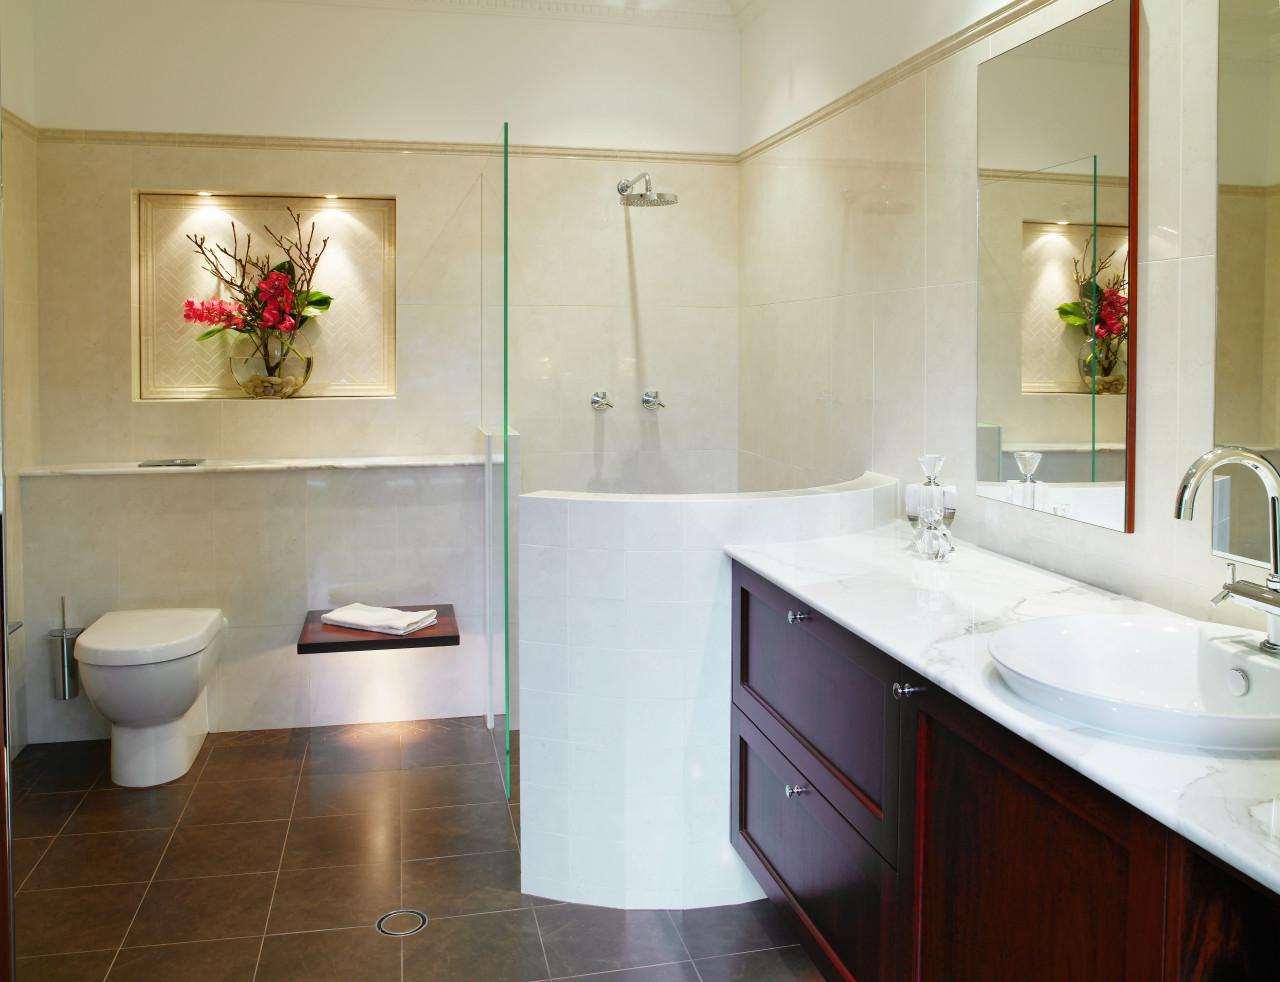 A view of the master ensuite, tiled floors bathroom, bathroom accessory, bathroom cabinet, floor, home, interior design, plumbing fixture, product design, real estate, room, sink, orange, gray